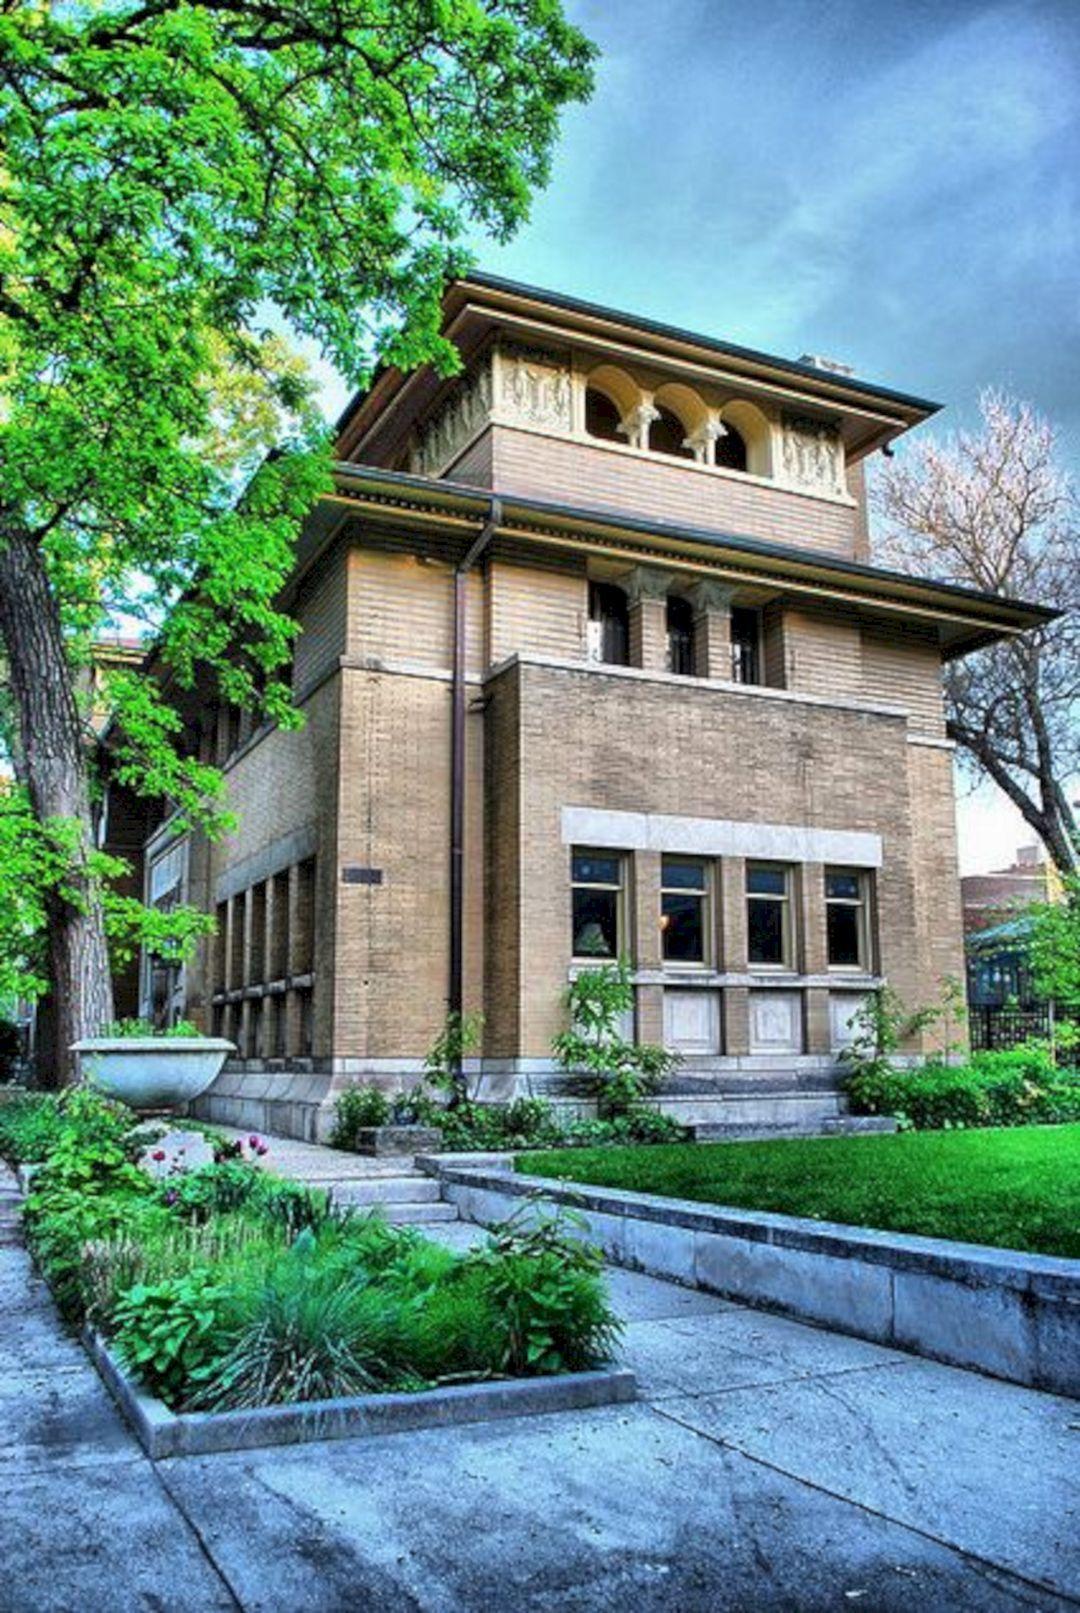 65 Best Frank Lloyd Wright Architecture Collections Freshouz Com Frank Lloyd Wright Architecture Frank Lloyd Wright Style Frank Lloyd Wright Buildings